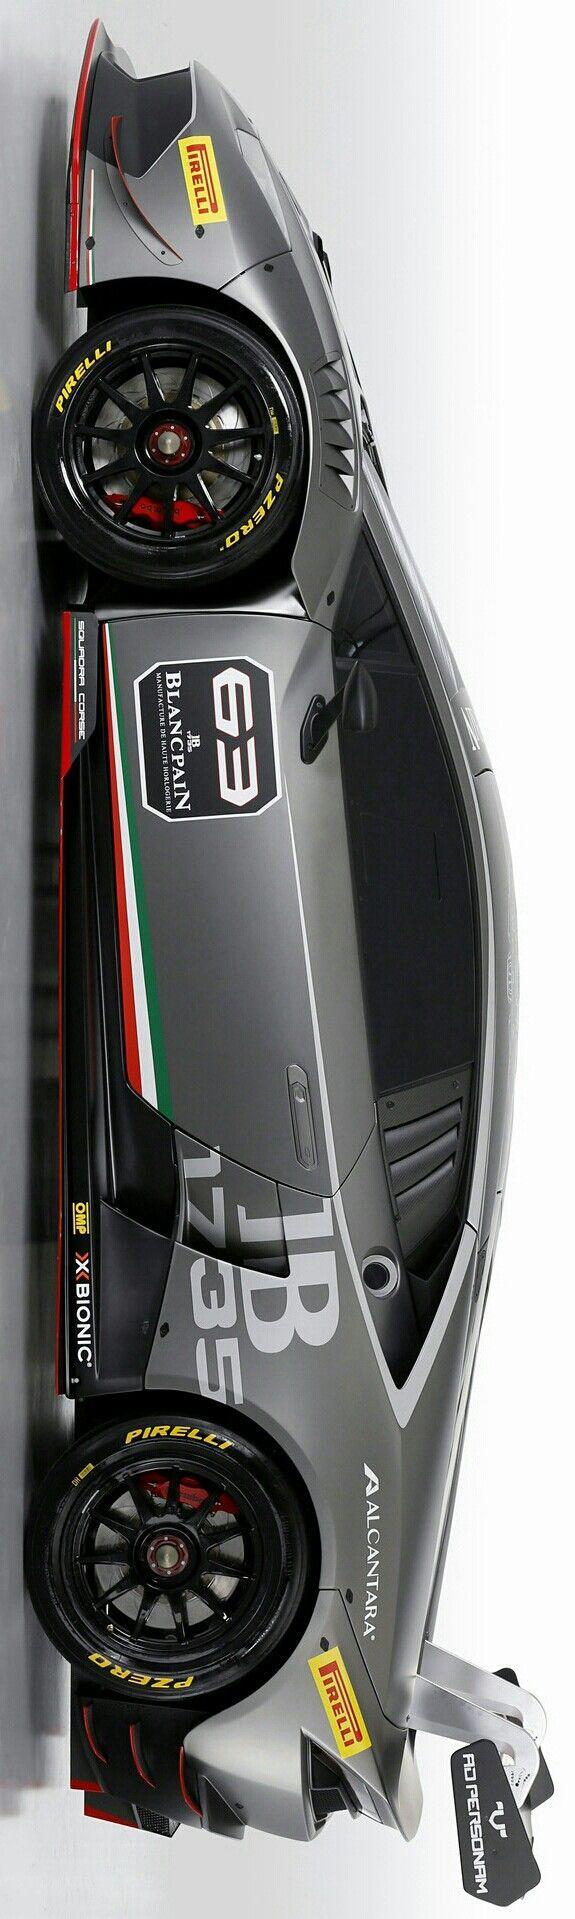 Stelios Karalis || ☆ ✲~ Luxury Connoisseur ~ ✲ ️2015 Lamborghini Huracan LP620-2 Super Trofeo by Stelios